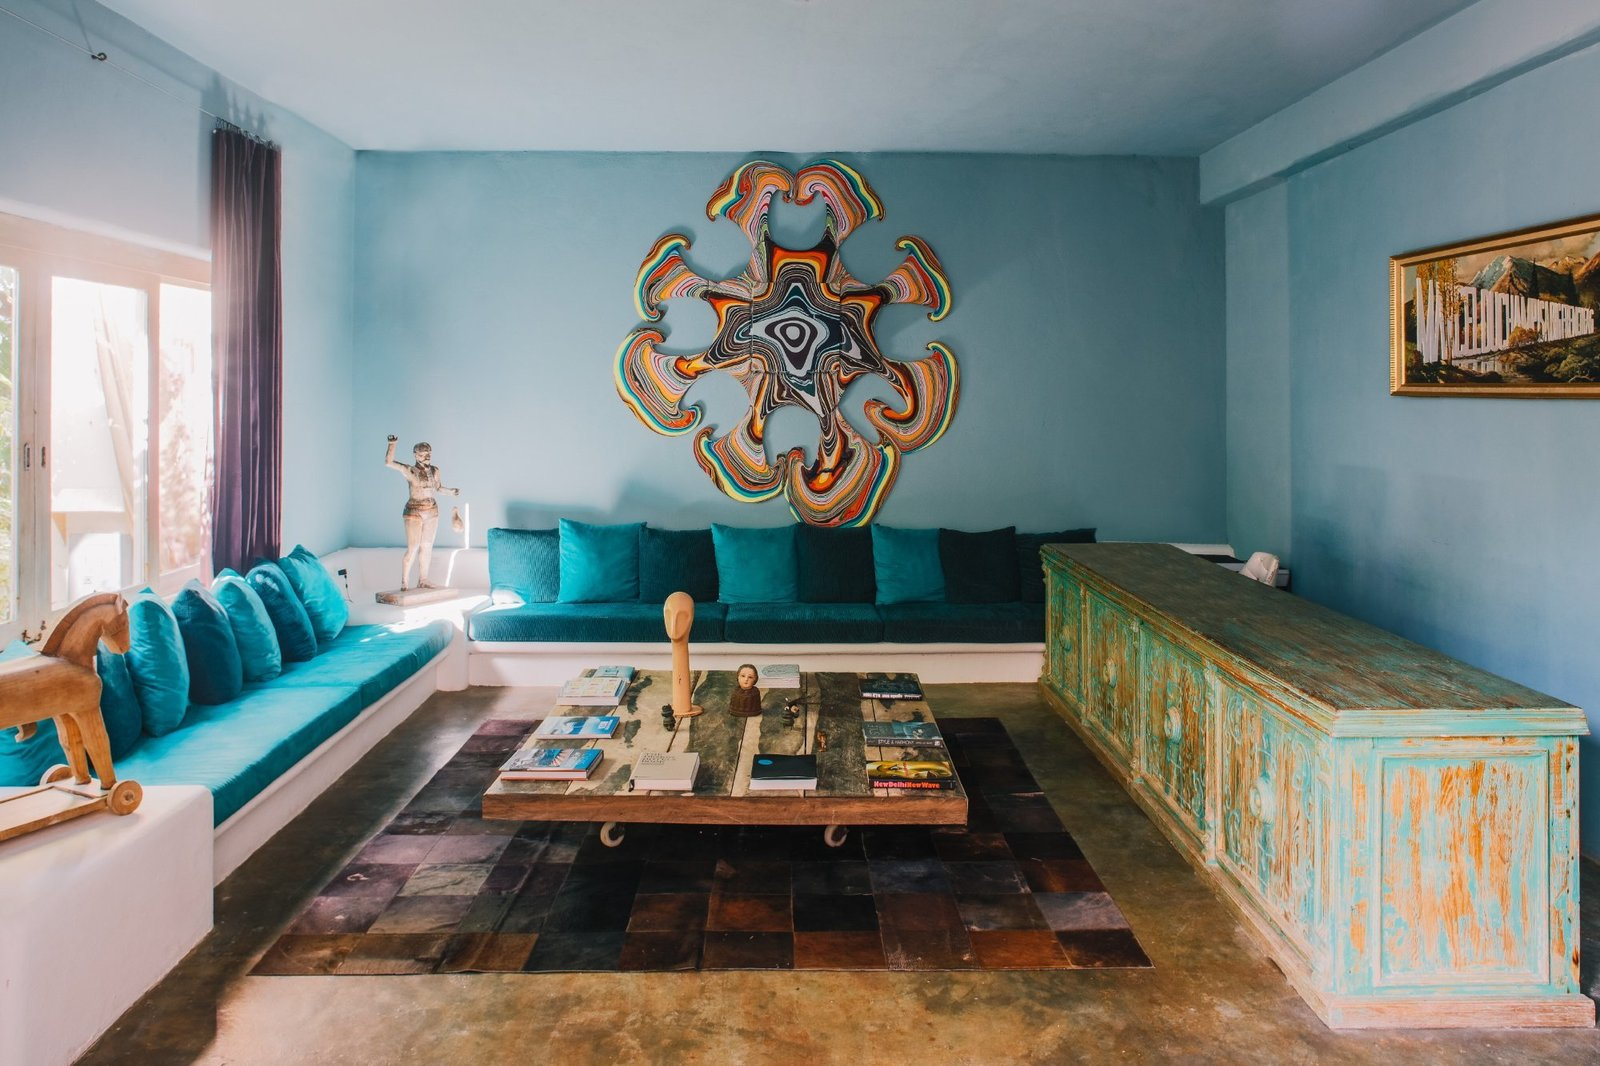 Living Room, Console Tables, Bench, Coffee Tables, Sofa, Concrete Floor, and Rug Floor  Casa Malca